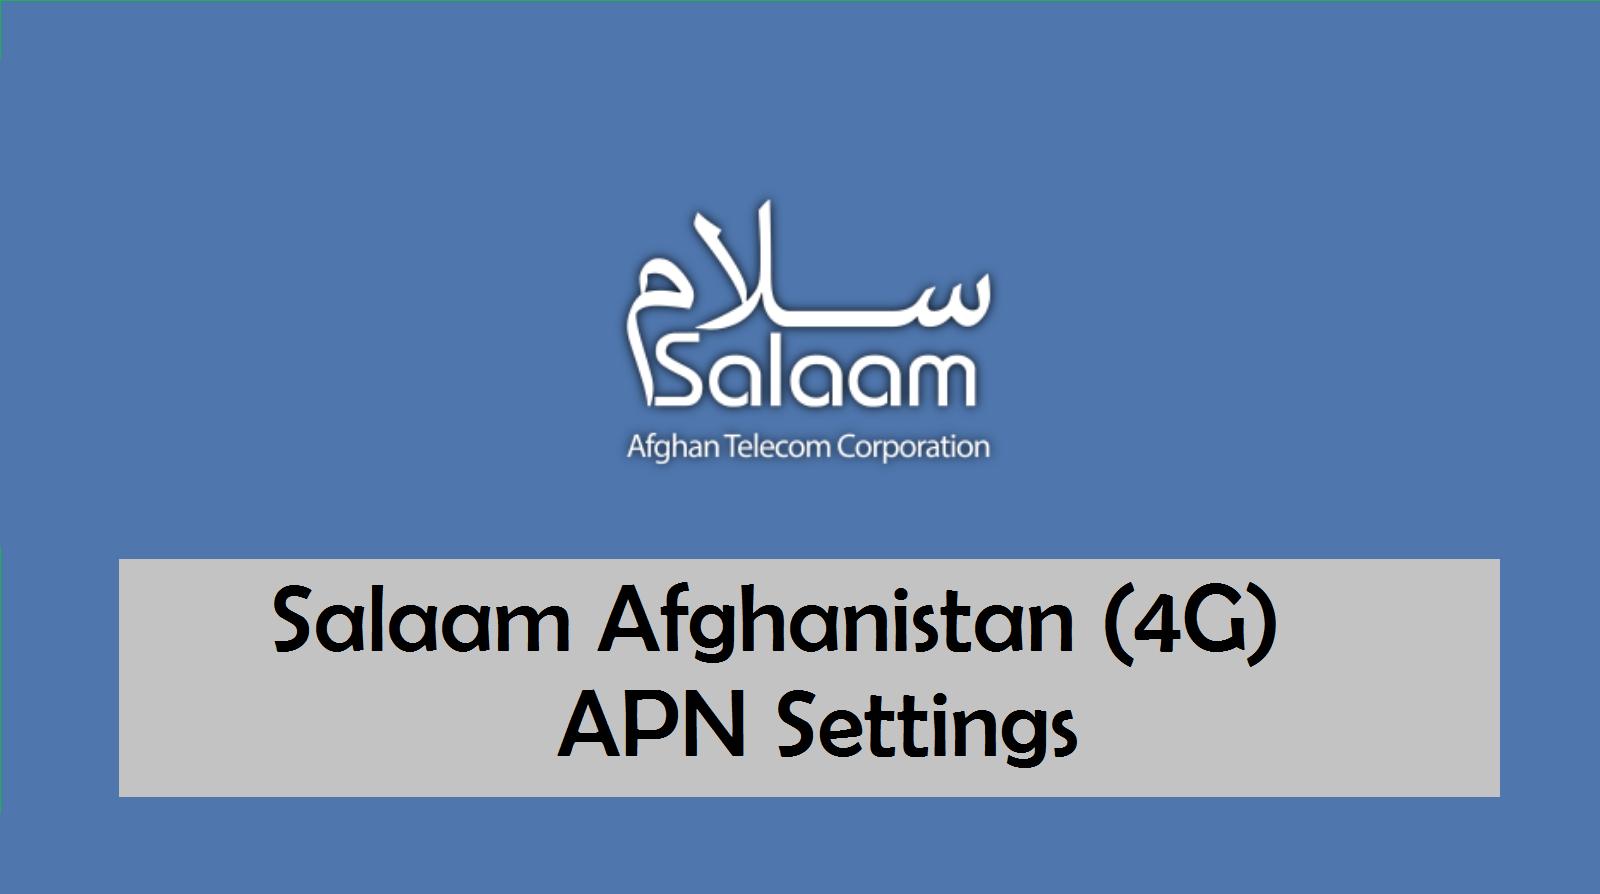 Salaam Afghanistan APN Settings for Android